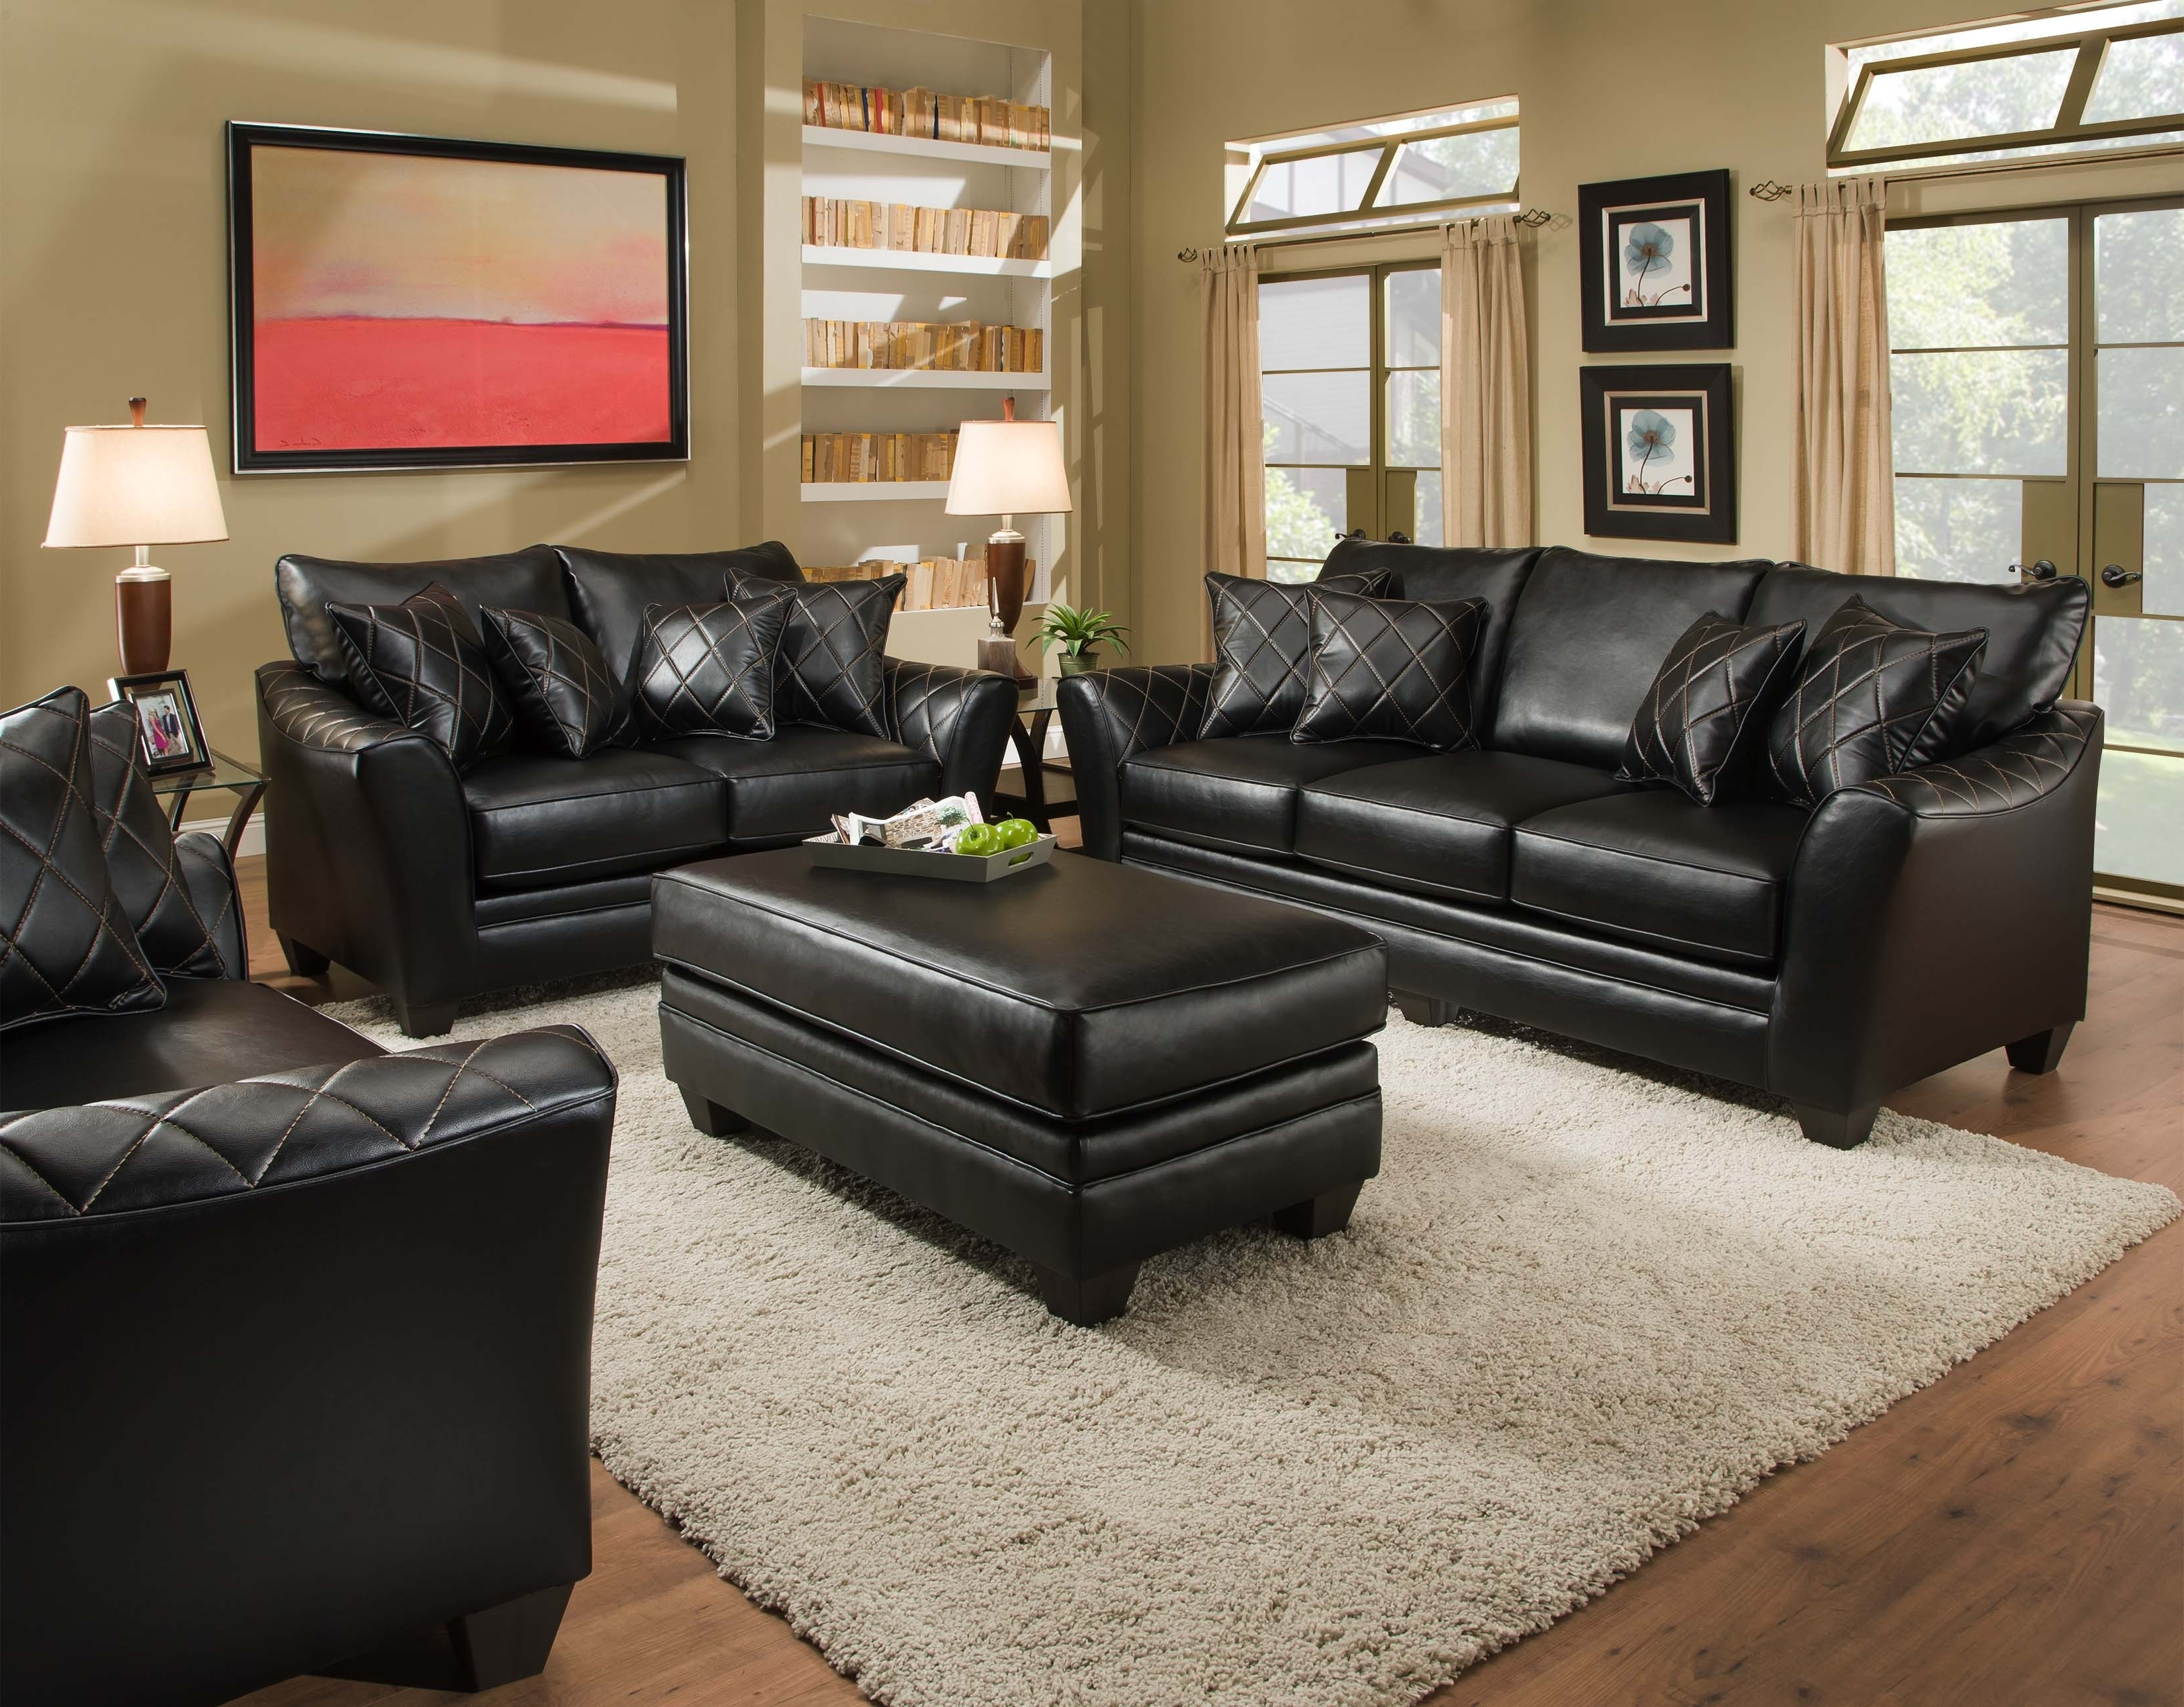 Luxury Sectional Sofa Nebraska Furniture Mart – Buildsimplehome Within Newest Nebraska Furniture Mart Sectional Sofas (View 8 of 15)